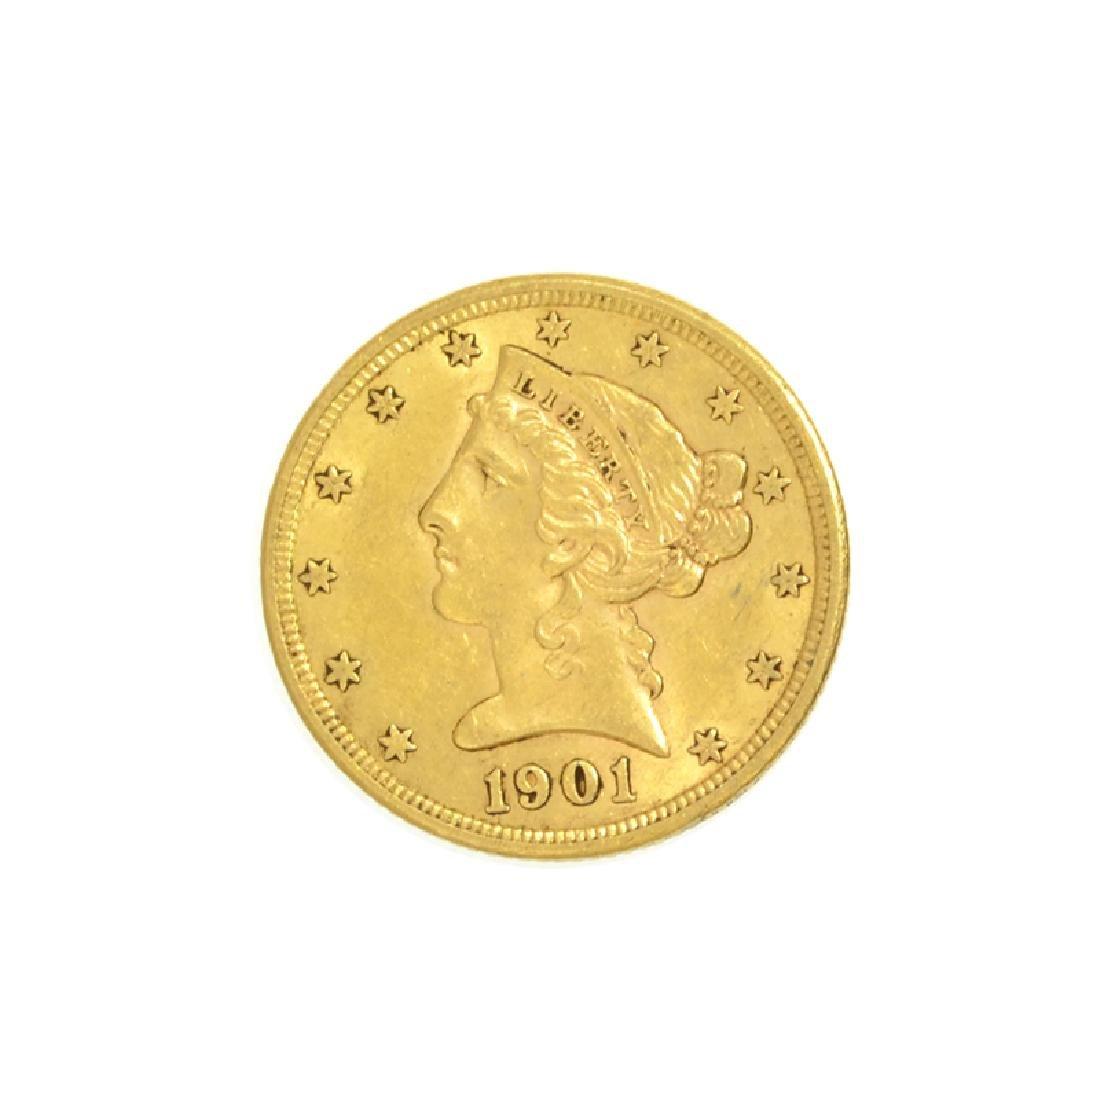 *1901-S $5 U.S. Liberty Head Gold Coin (DF)